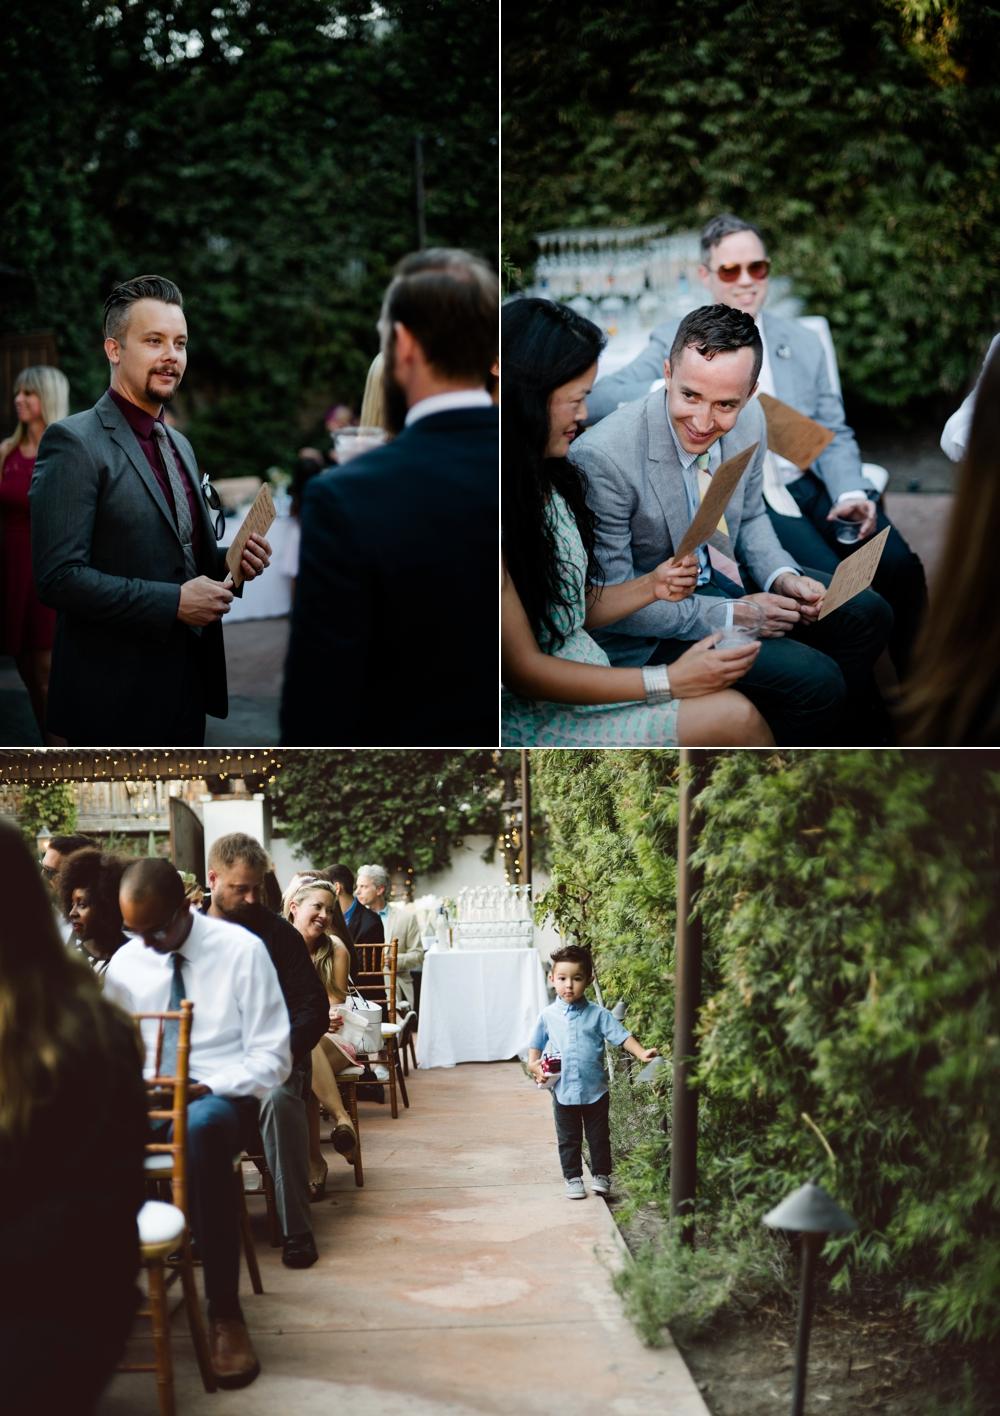 franciscan_garden_wedding_photography024.jpg